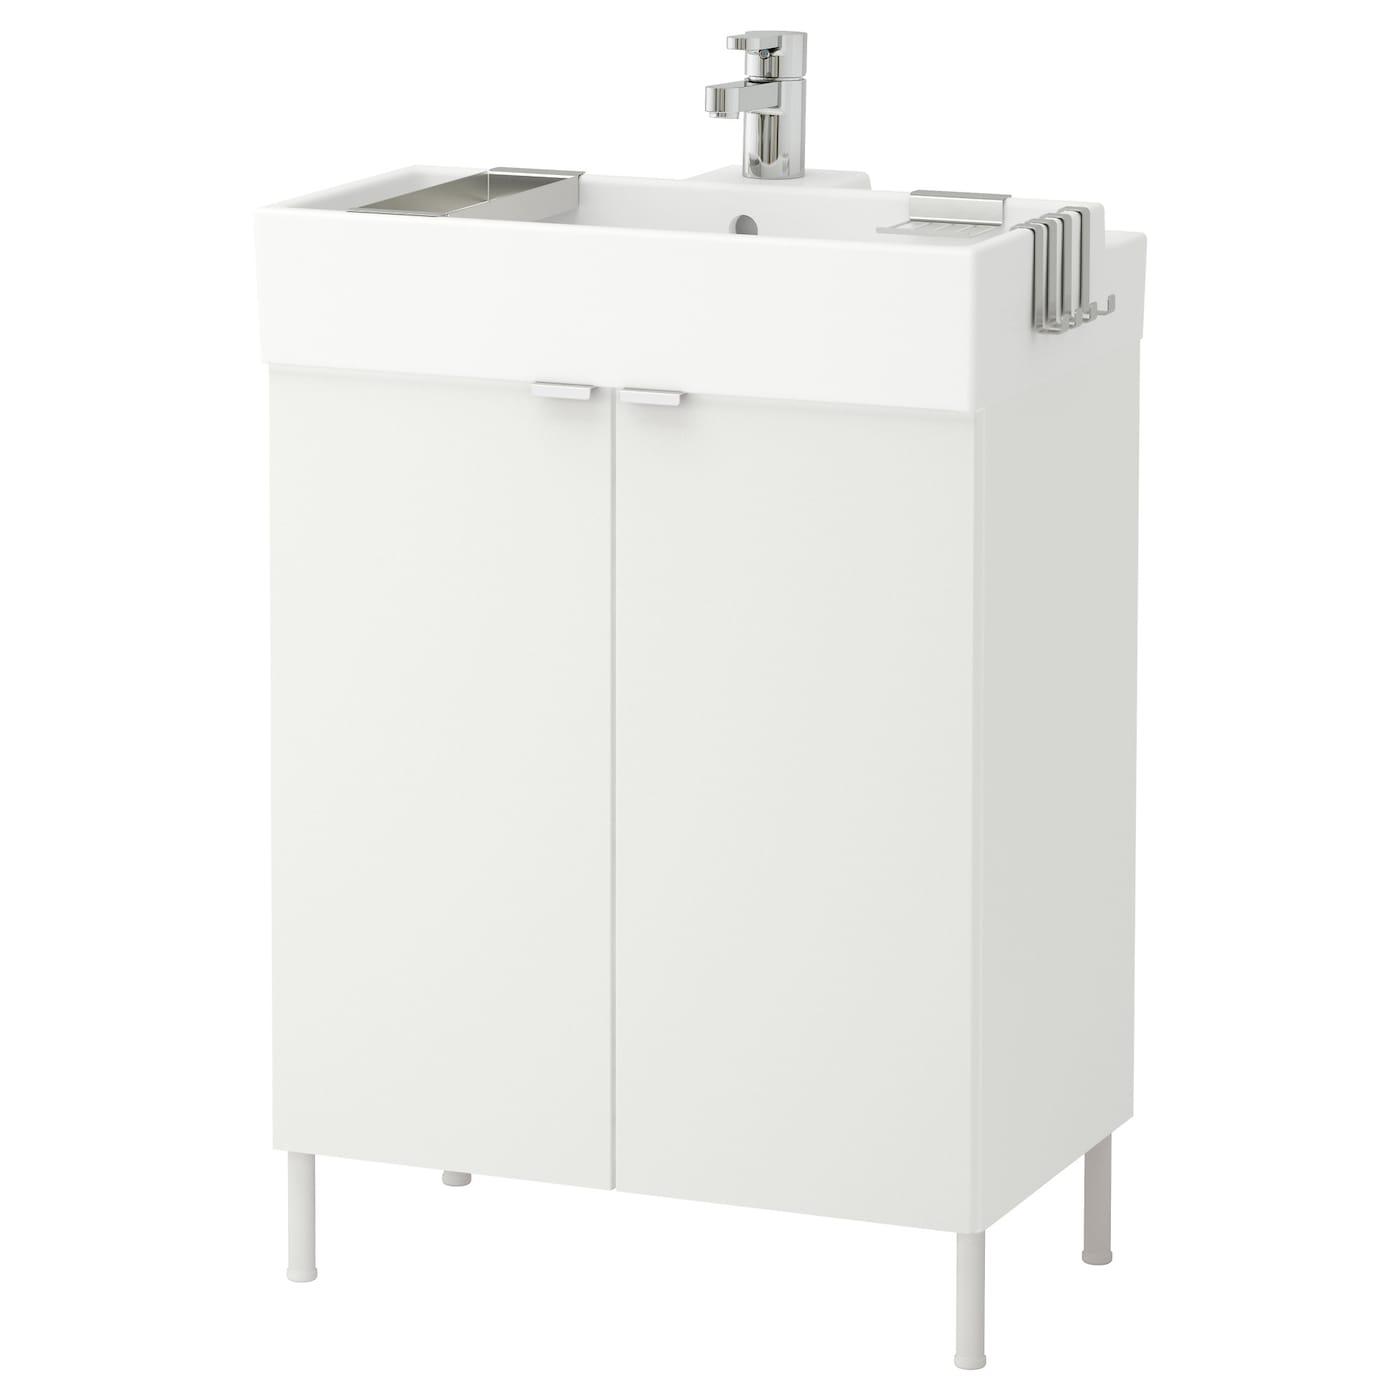 lill ngen l ment lavabo 2 portes blanc 60x41x87 cm ikea. Black Bedroom Furniture Sets. Home Design Ideas